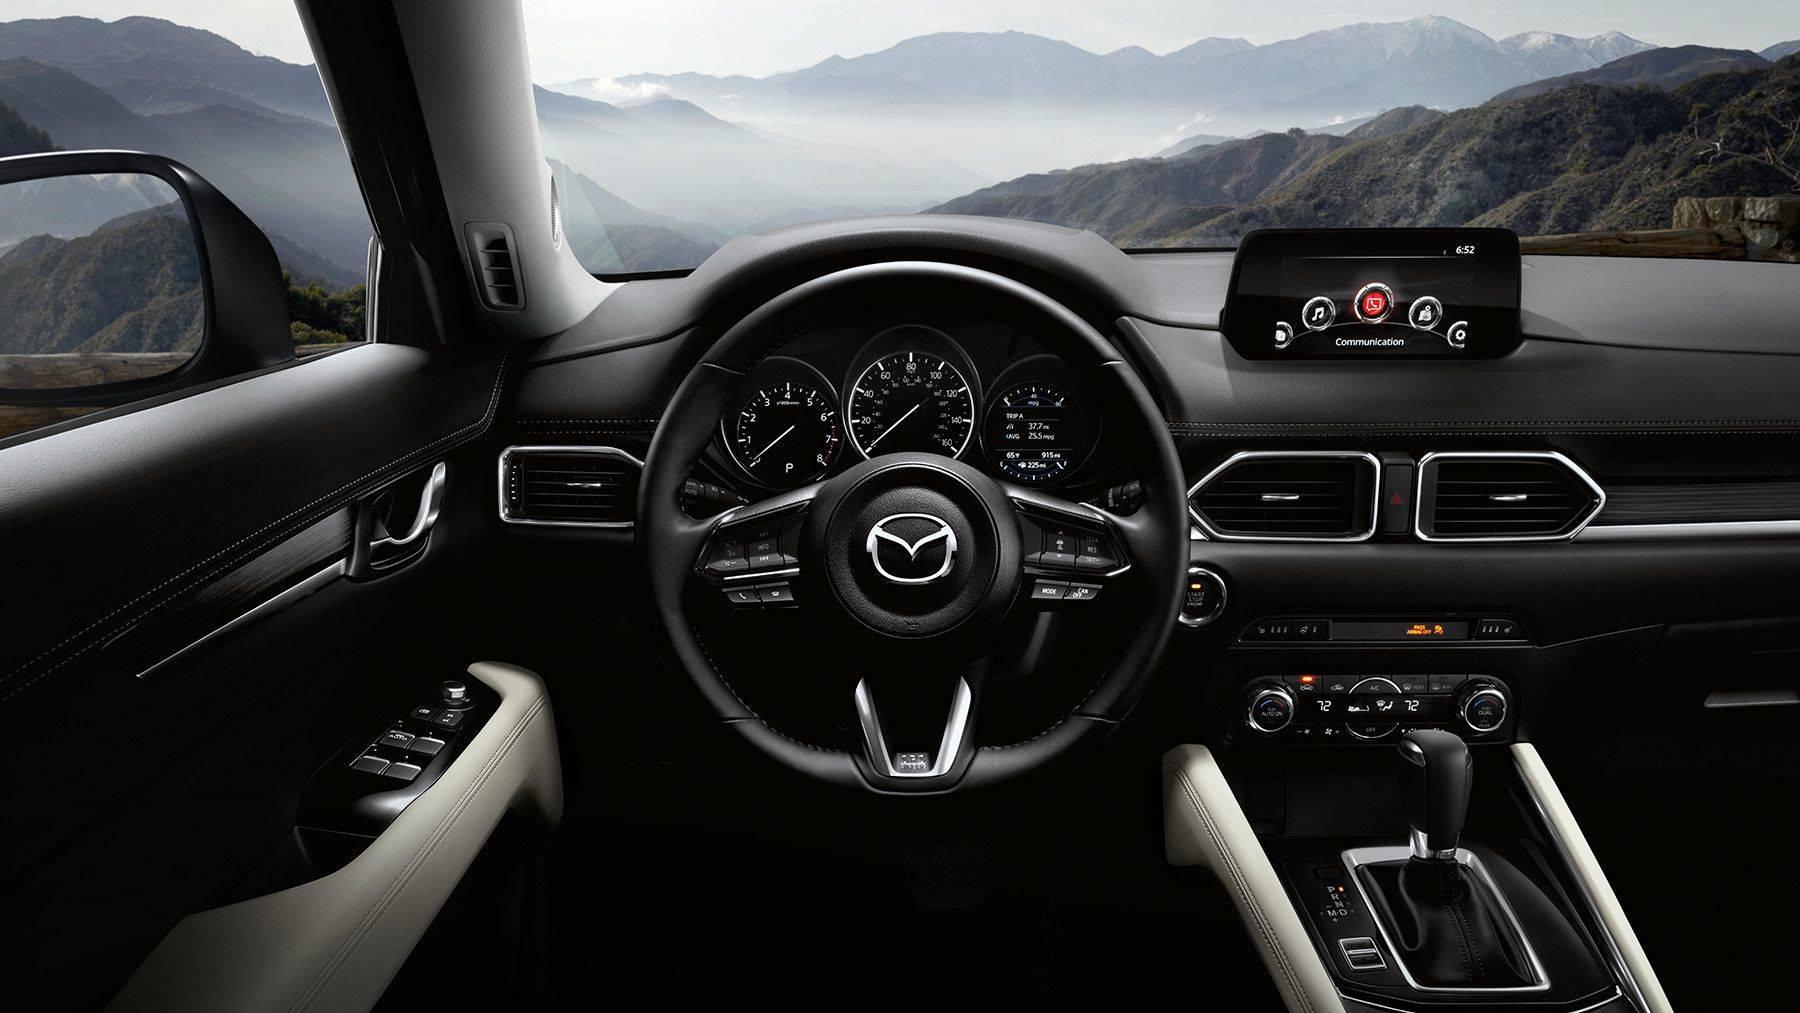 The Mazda CX-5's Luxurious Interior